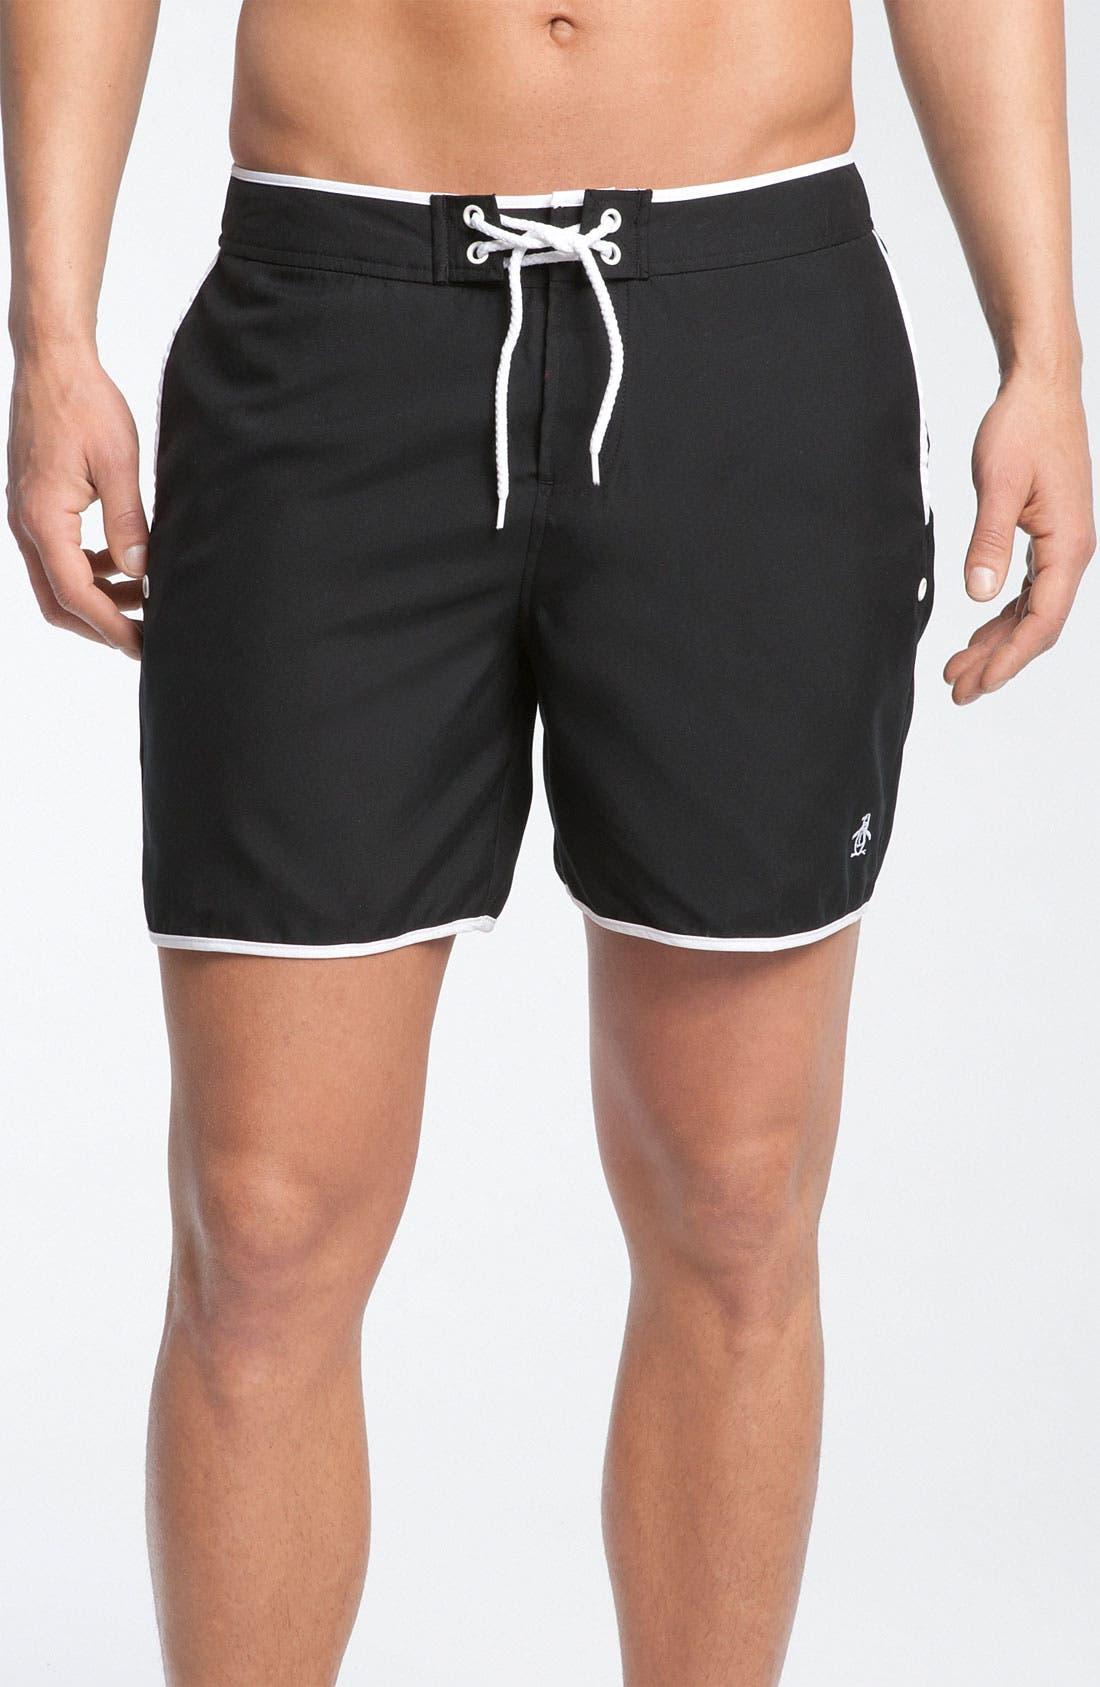 Alternate Image 1 Selected - Original Penguin Solid Volley Swim Shorts